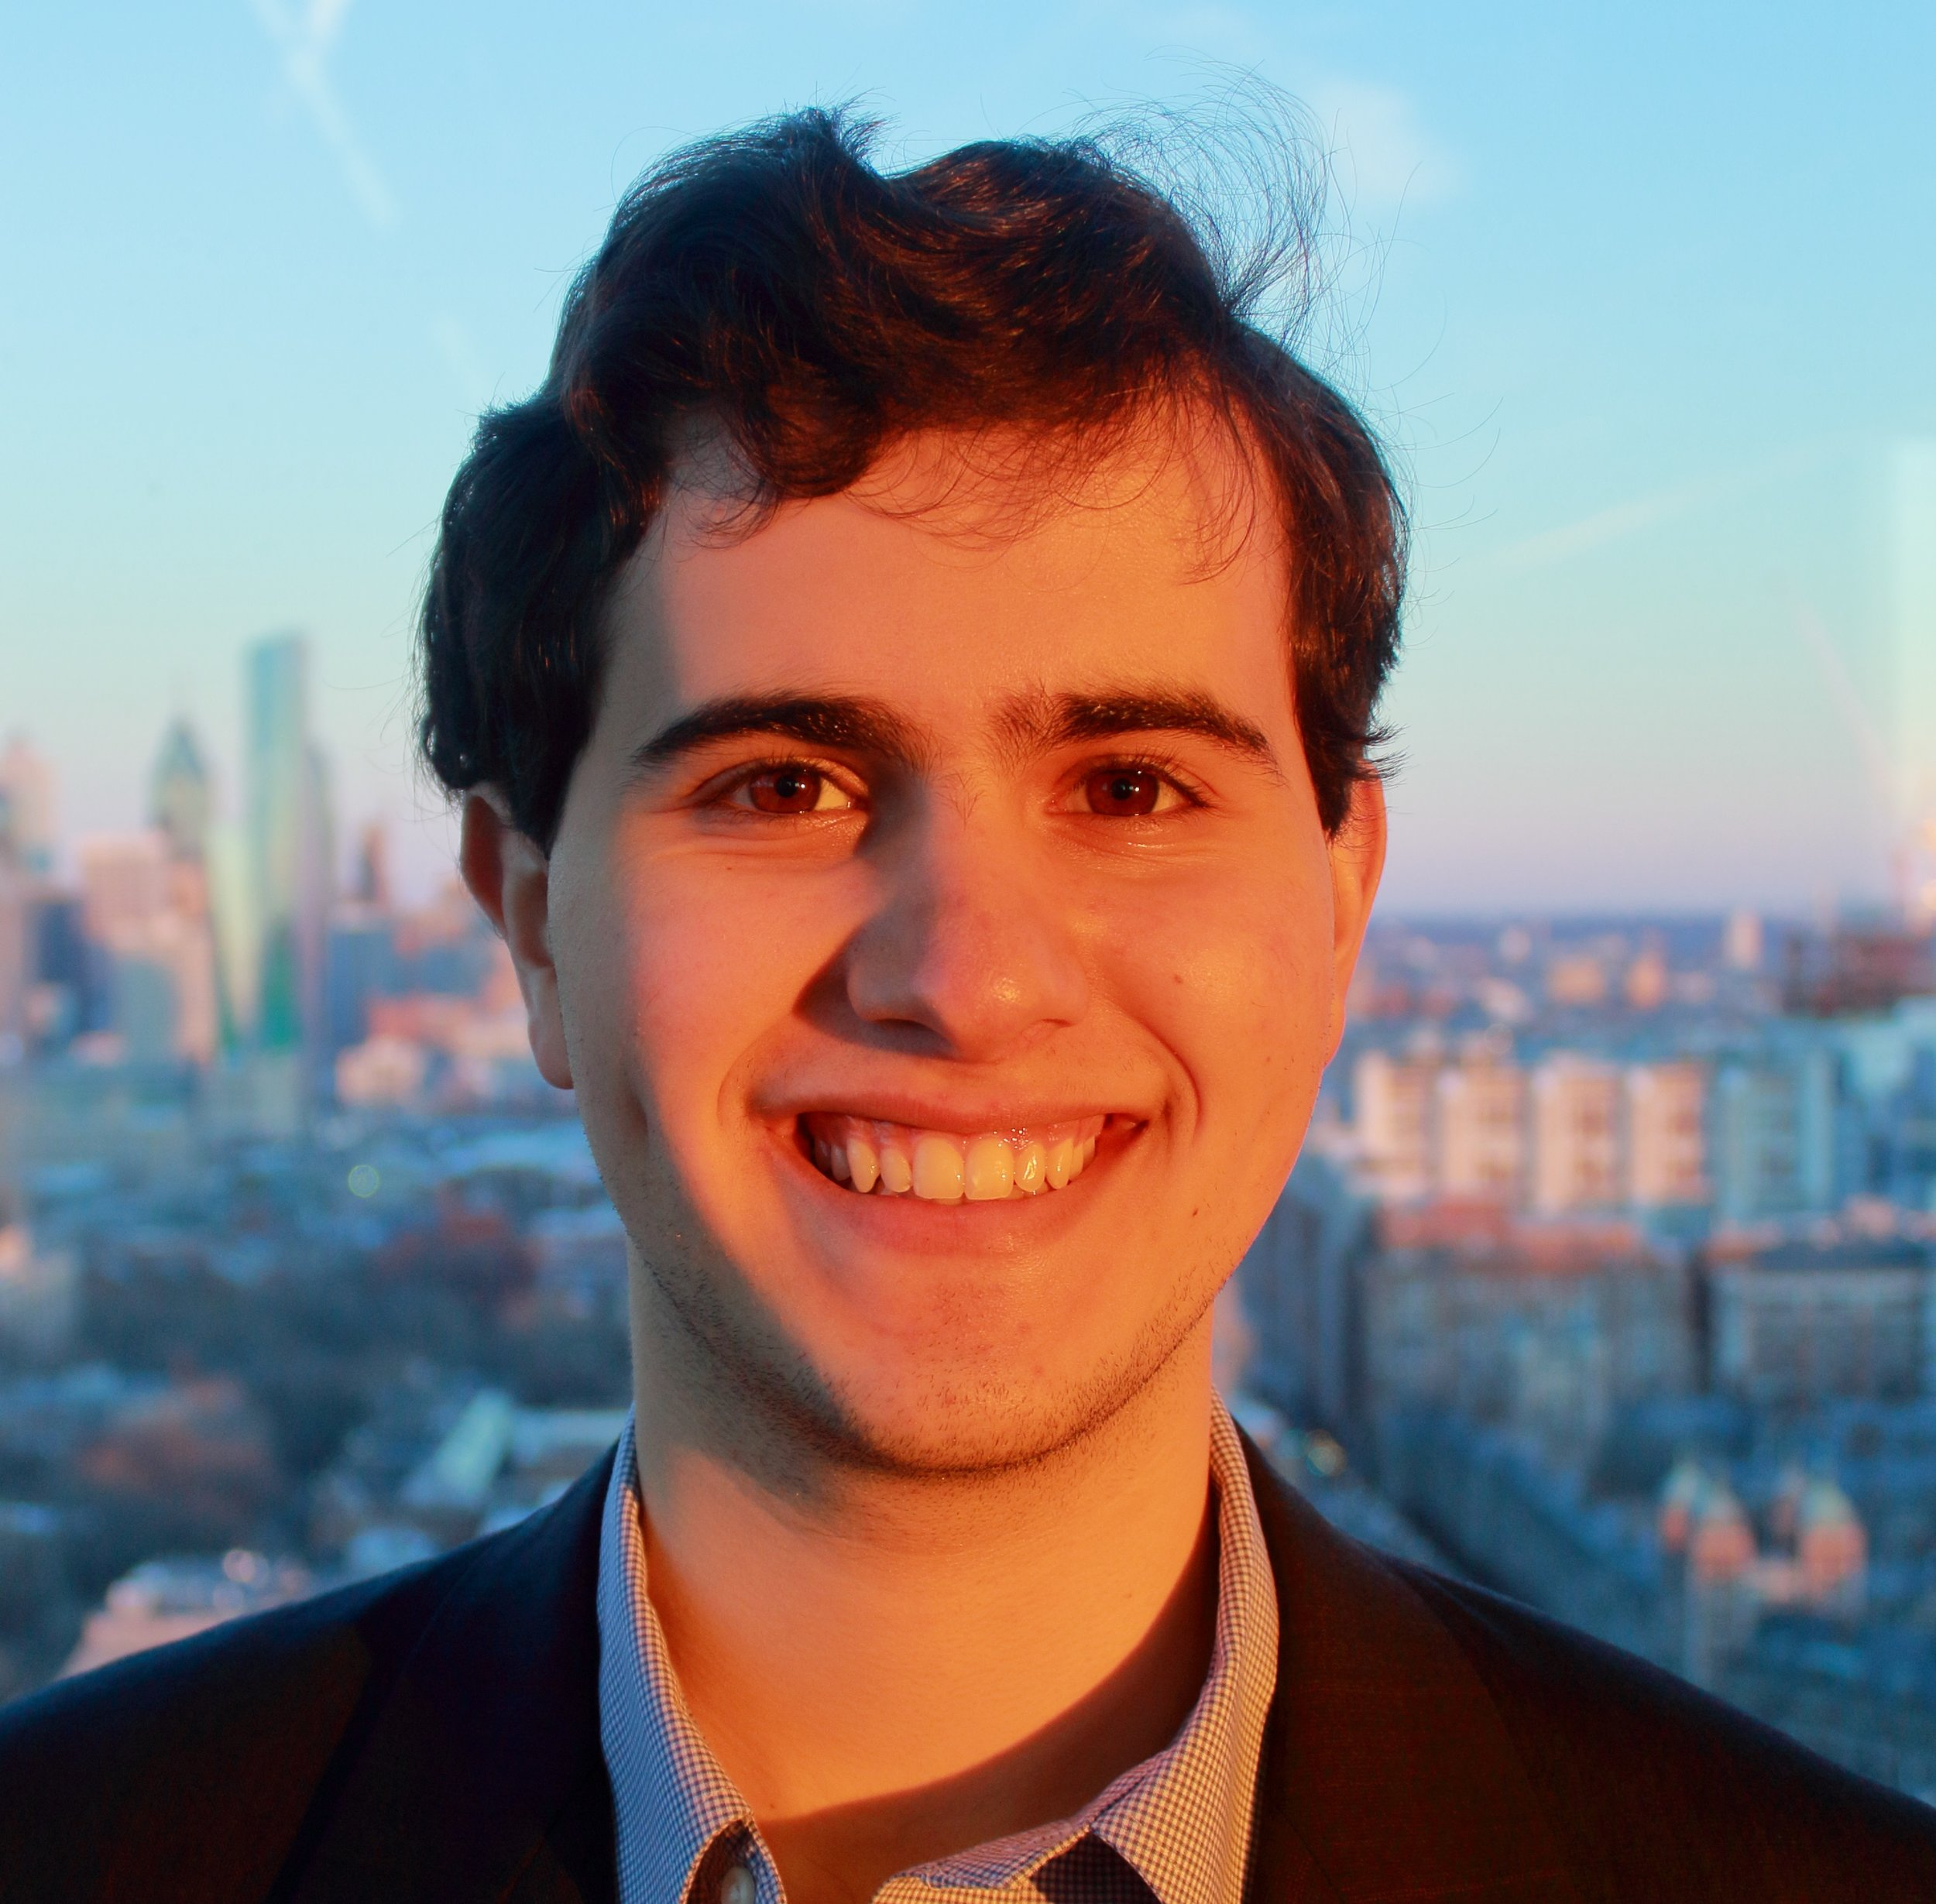 Samuel Kaufmann - Undergraduate ResearcherSophomore, UPennsamka@sas.upenn.edu